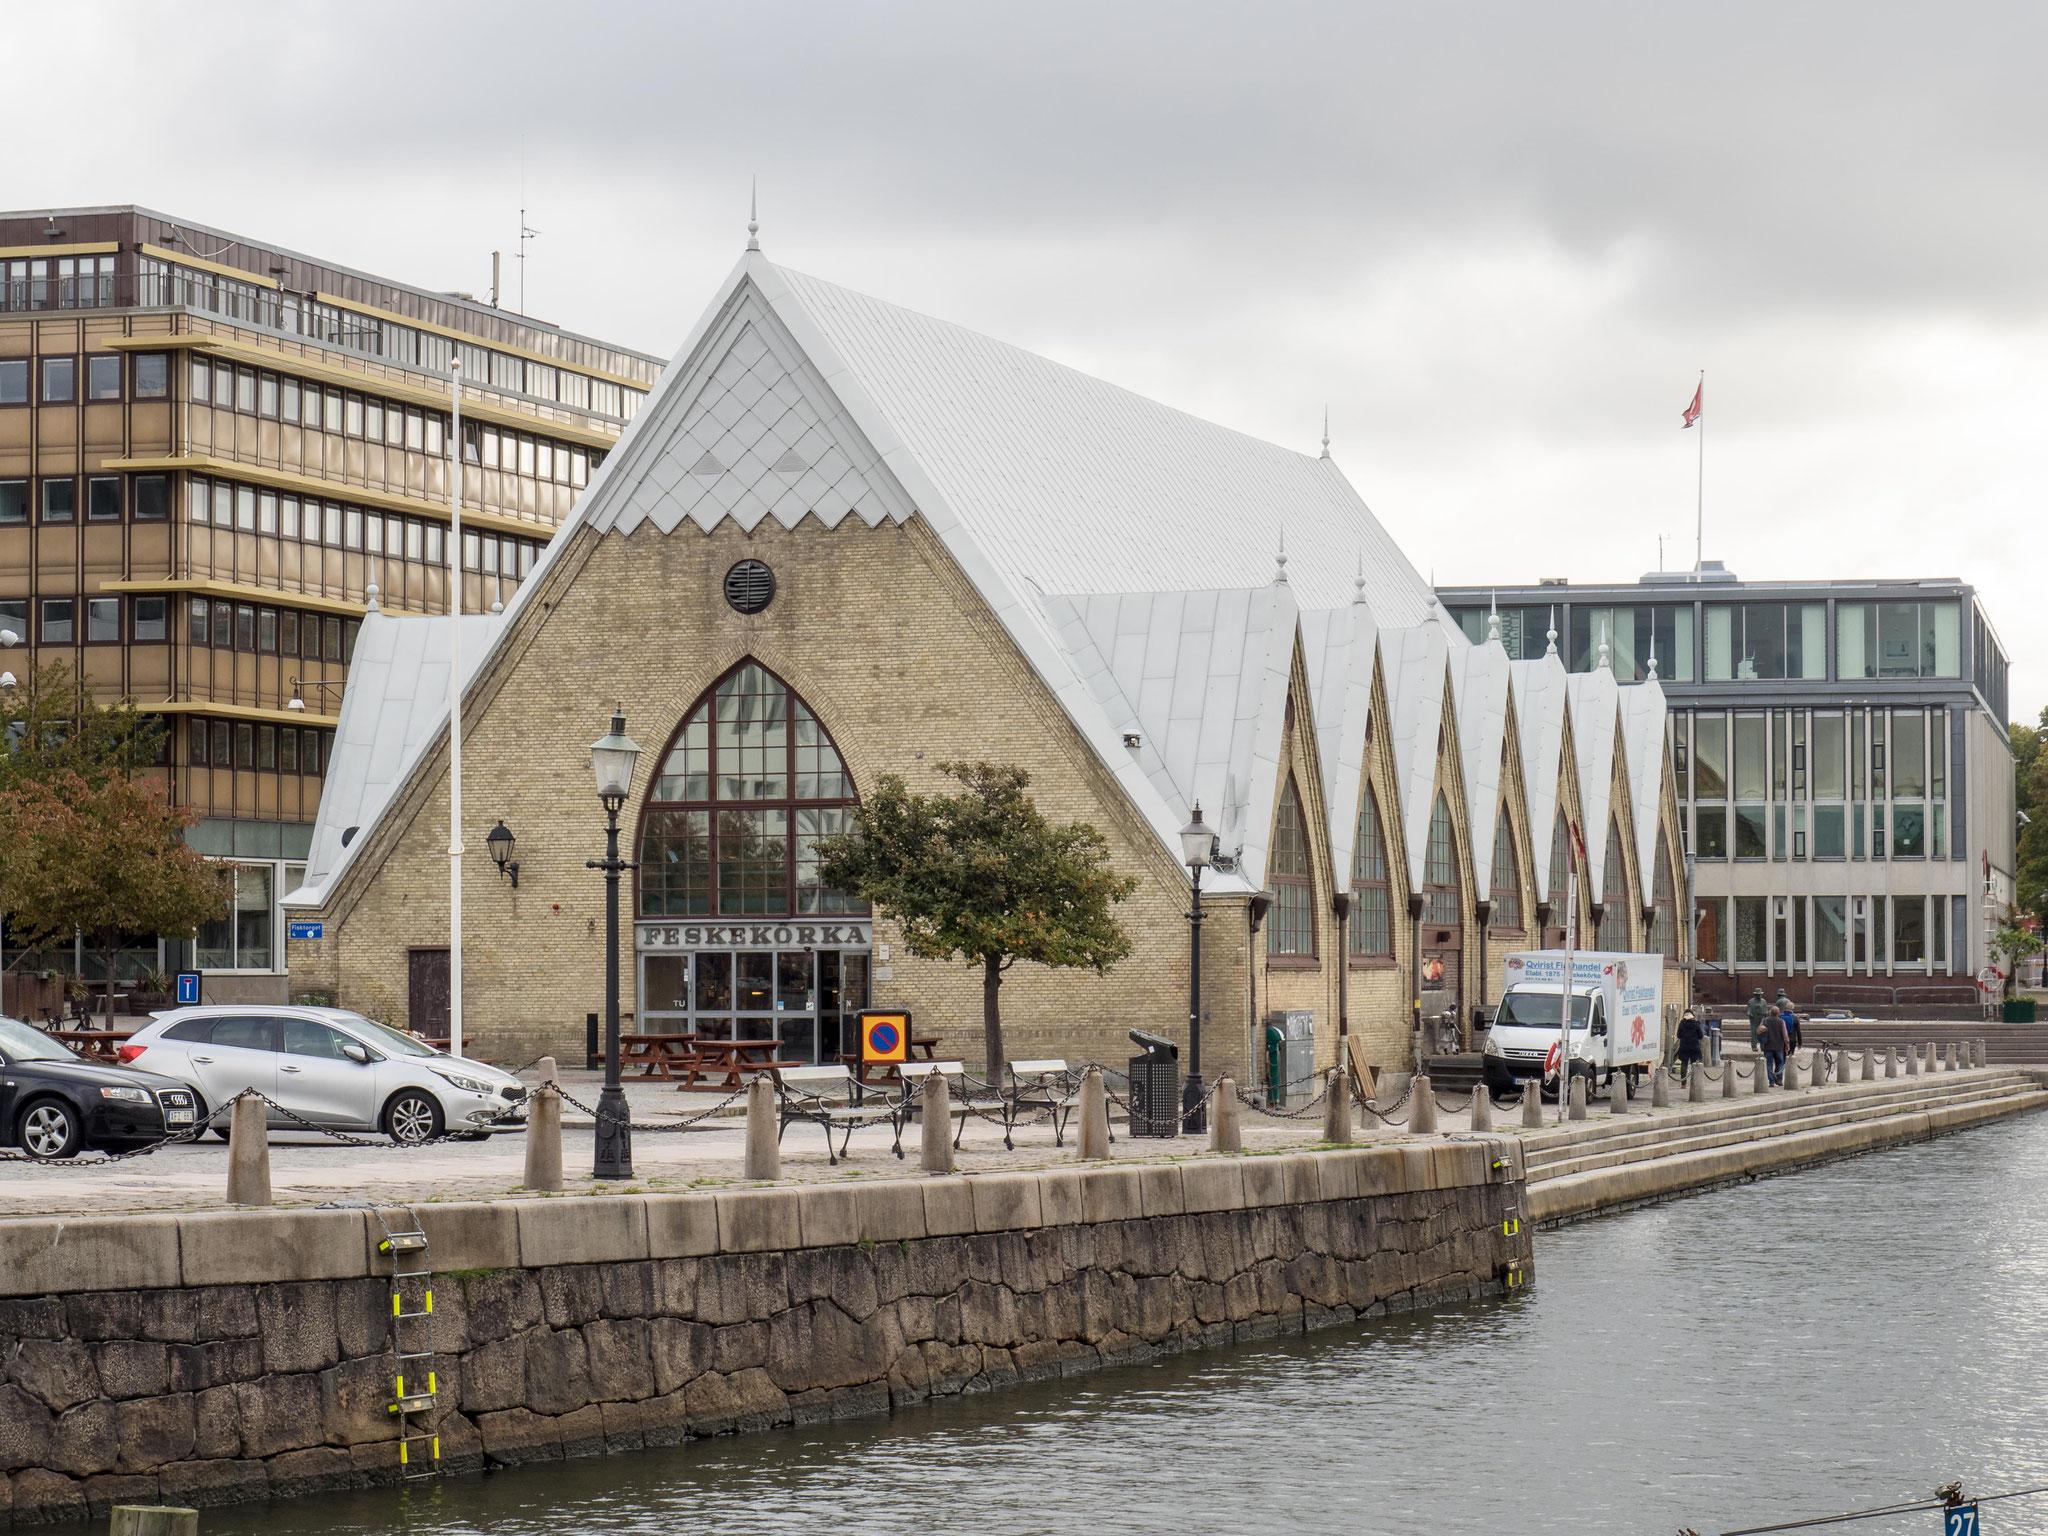 Fischkirche - Peskekörka